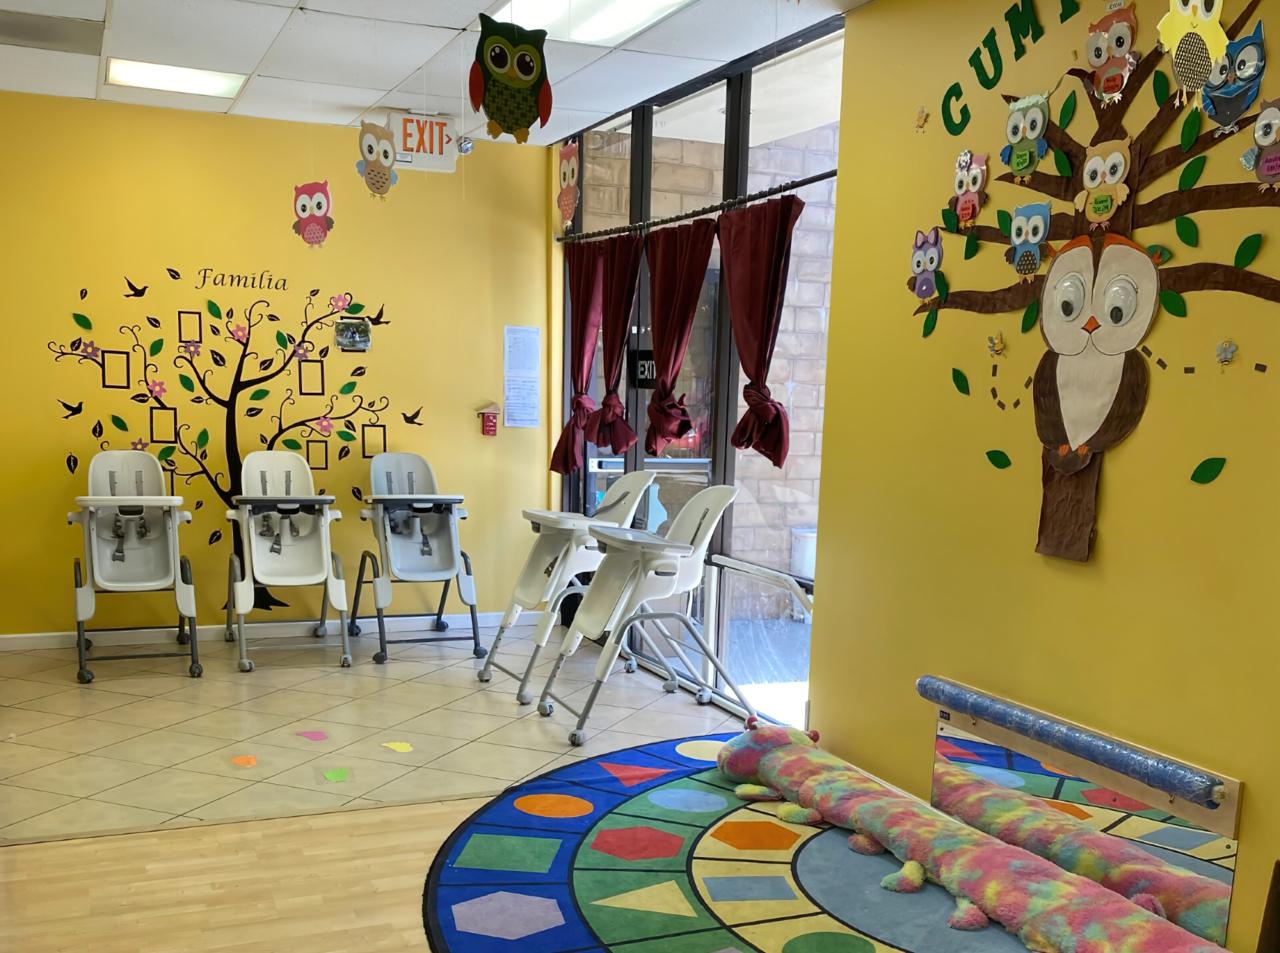 Spanish Immersion School & Daycare 3